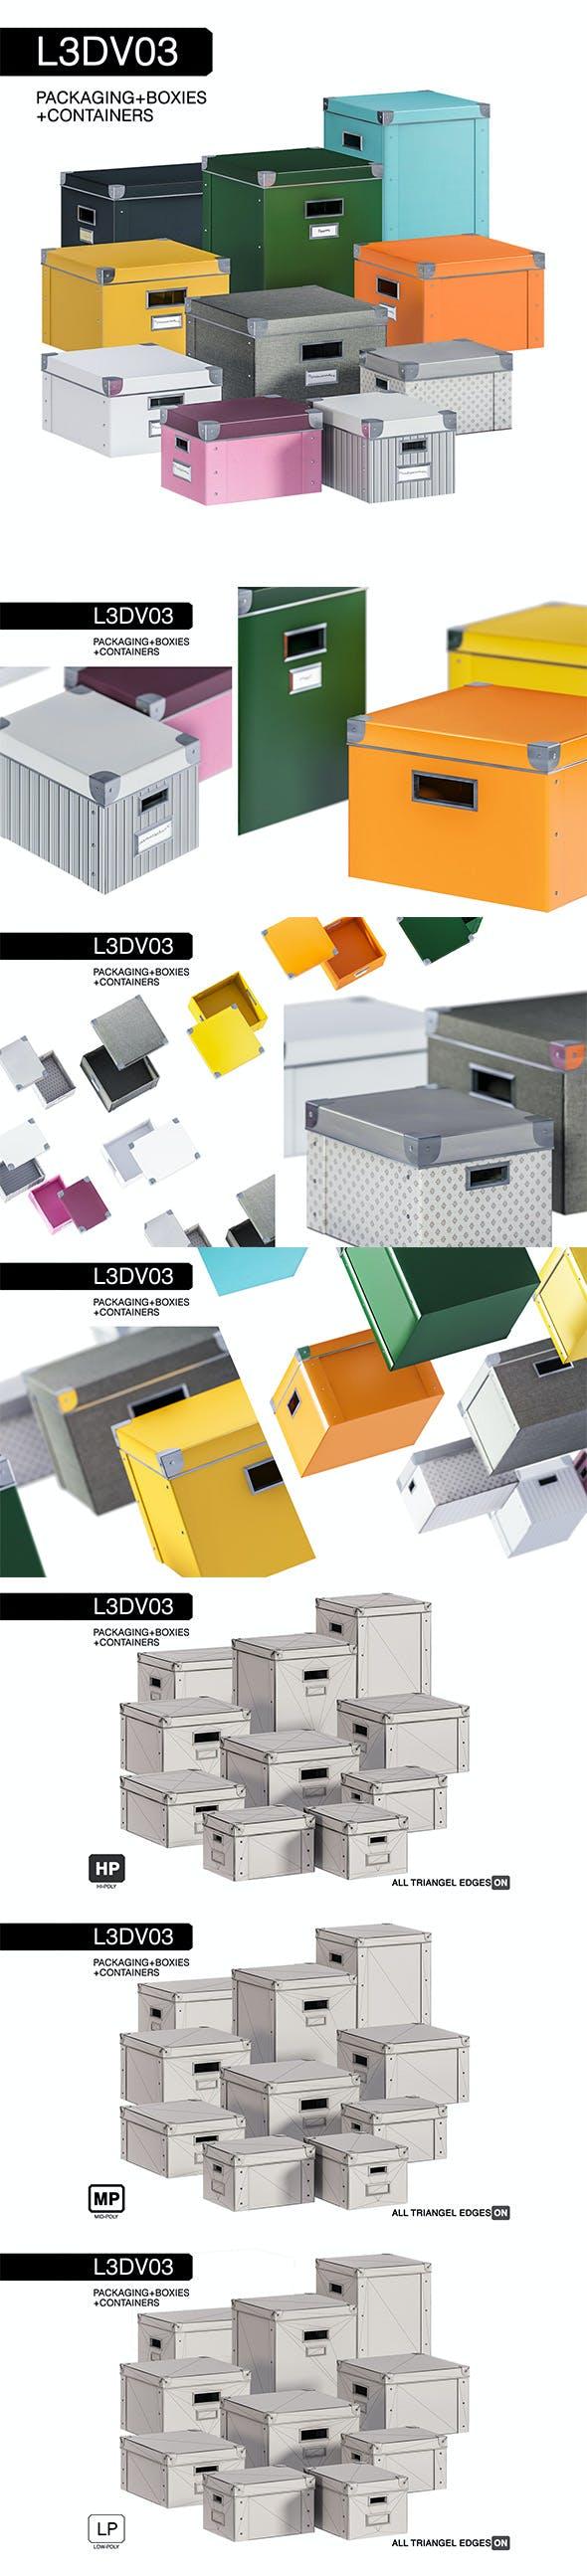 L3DV03G01 - boxes set - 3DOcean Item for Sale